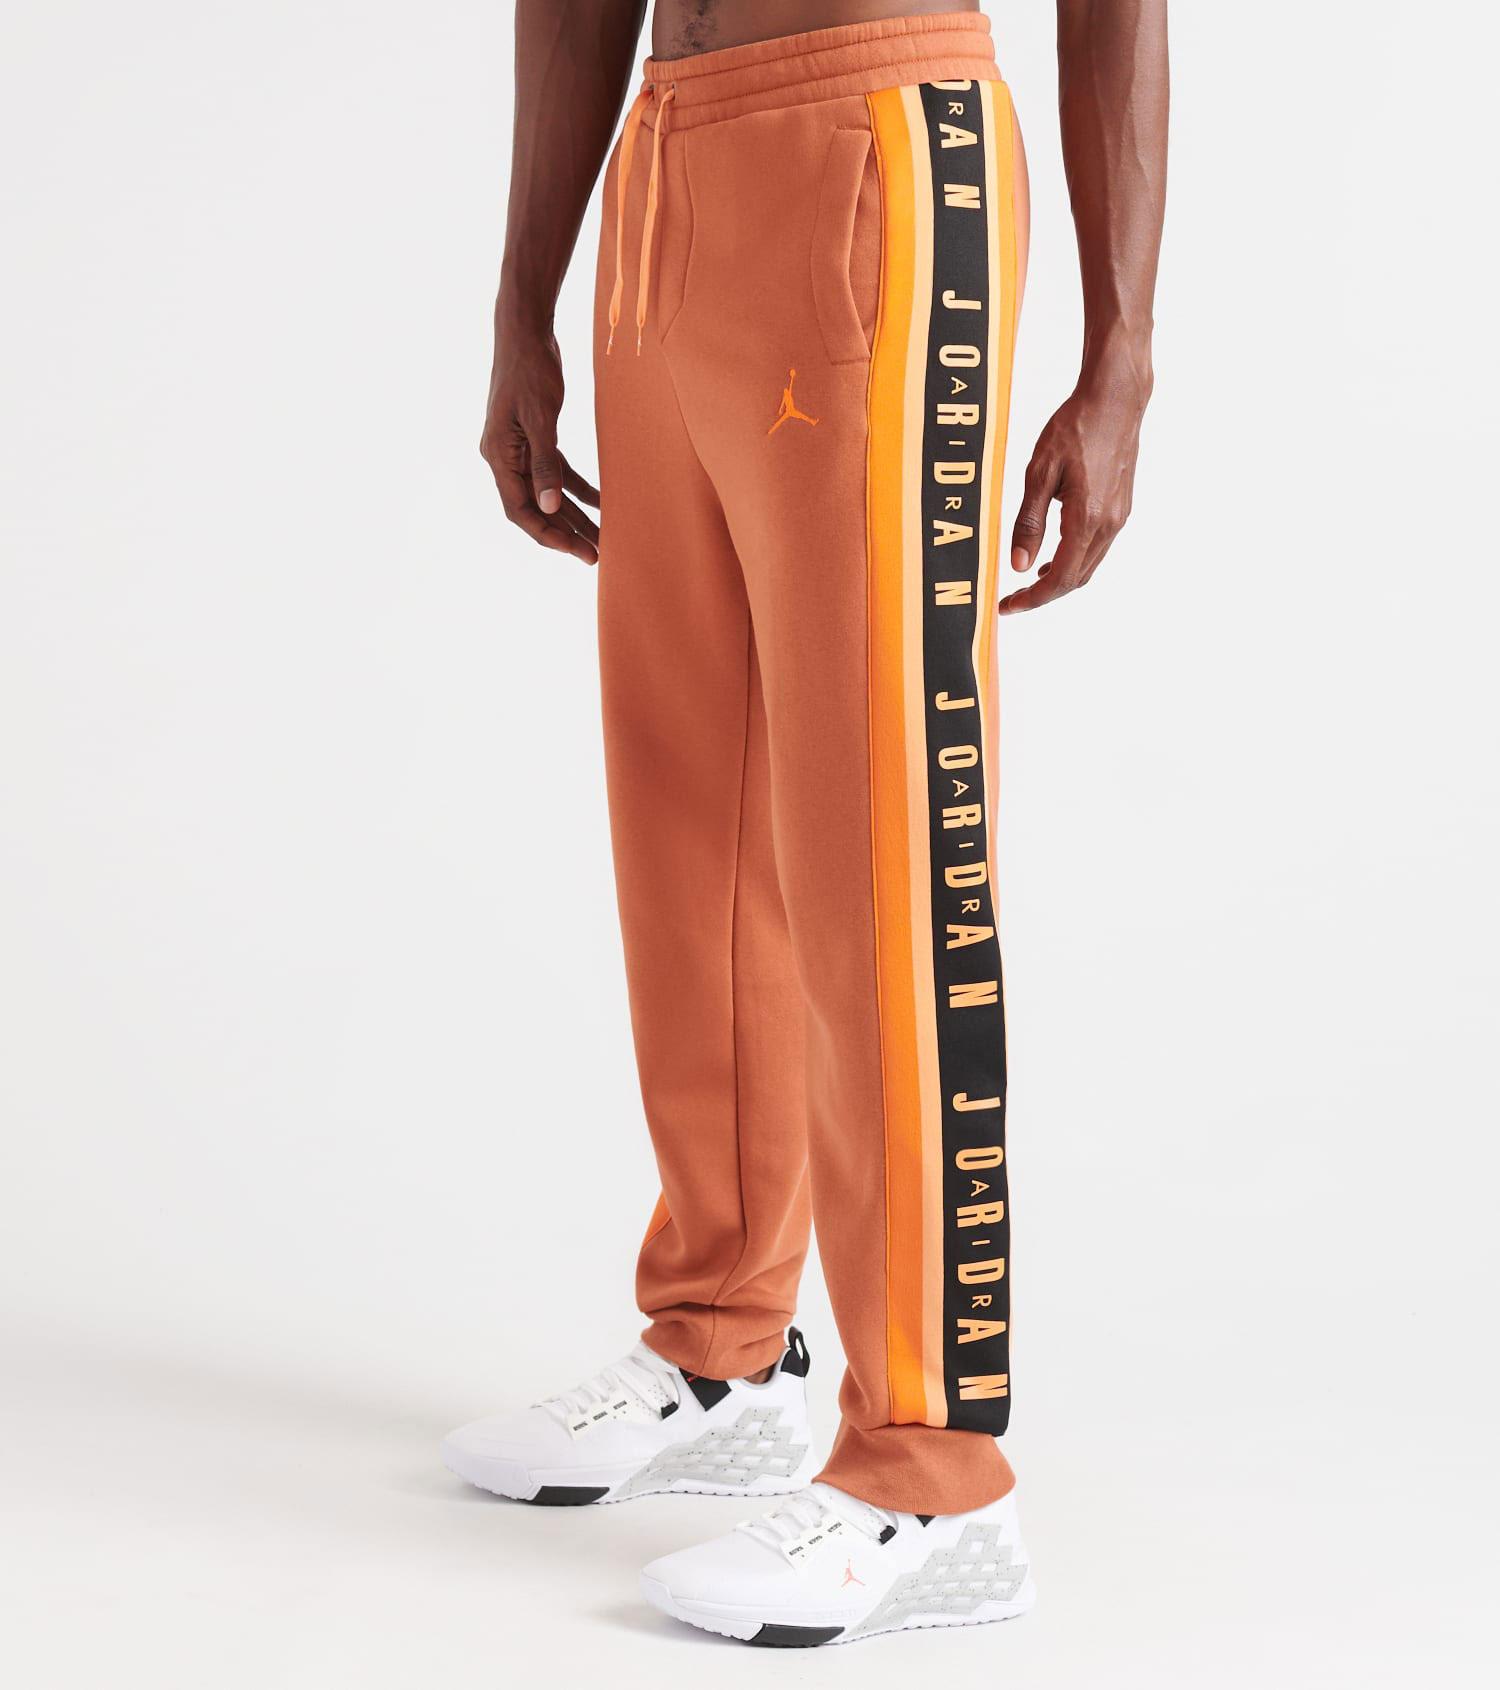 jordan-1-shattered-backboard-pants-1